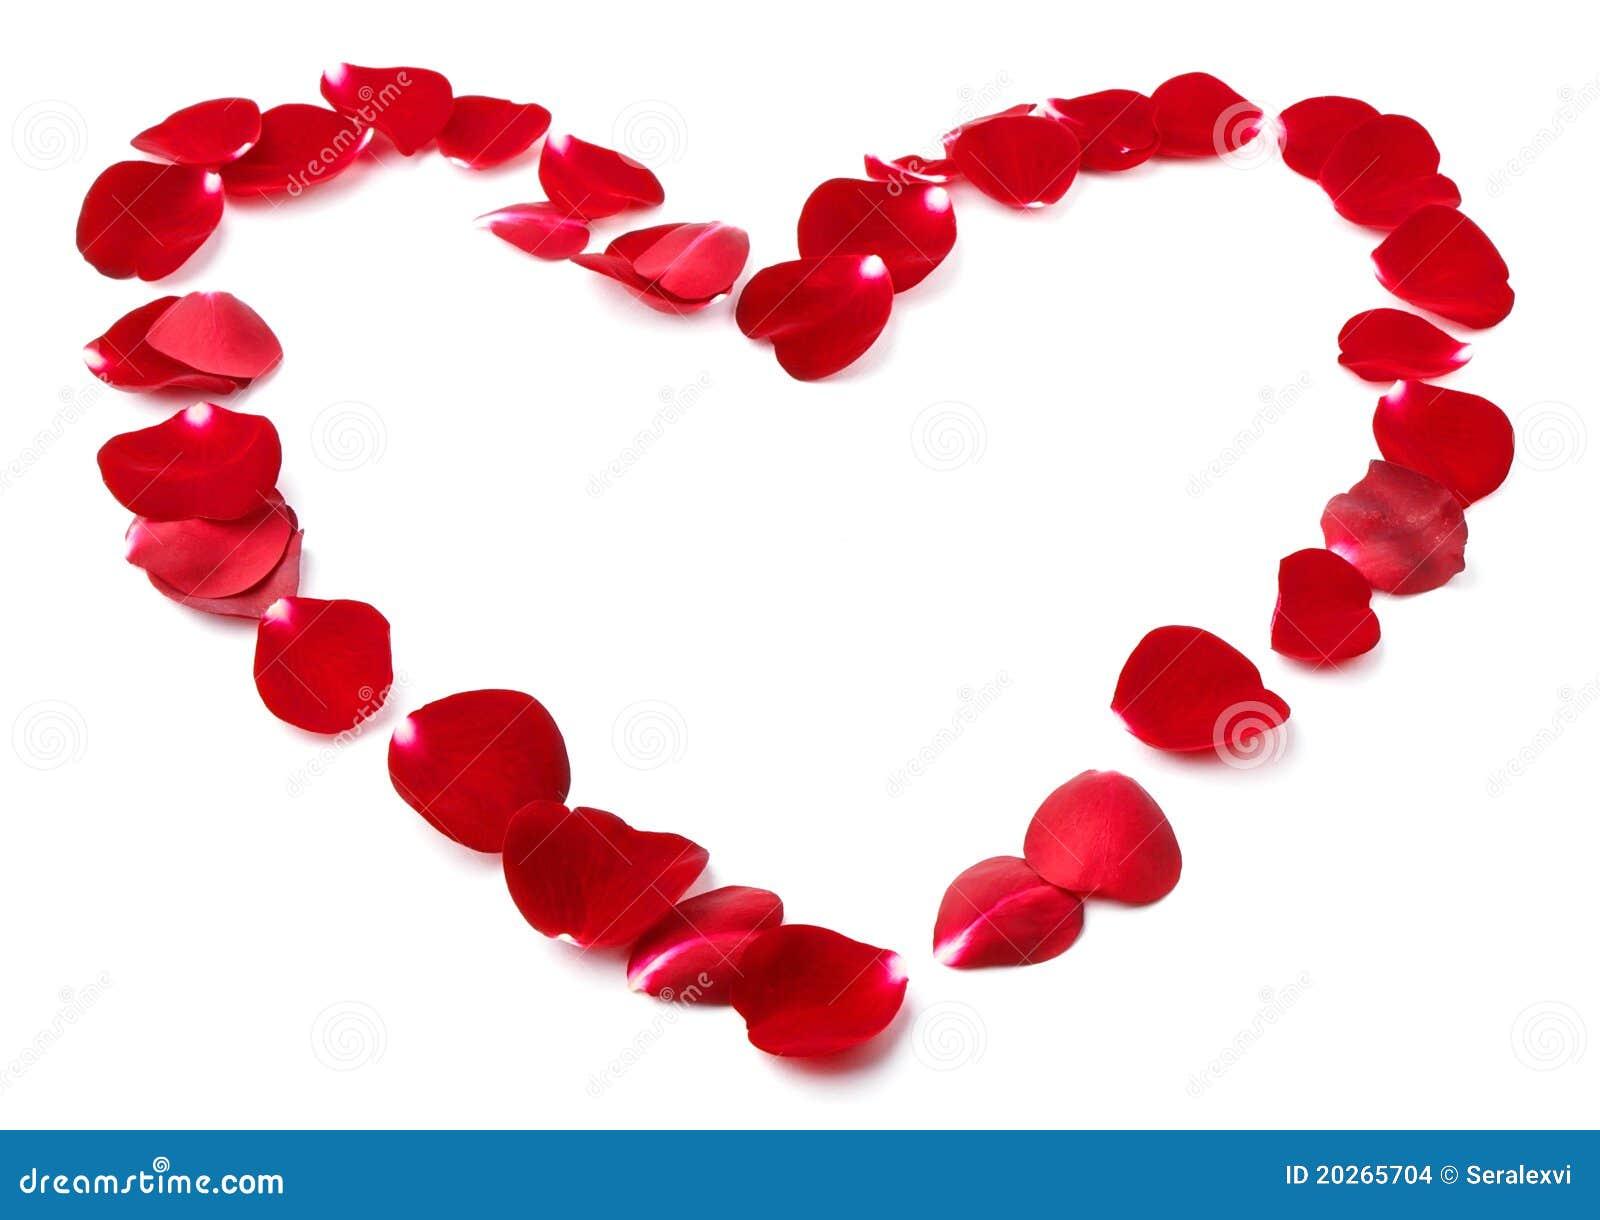 Petals of wild roses in shape of heart stock images image 20265704 - Fleur en forme de coeur ...